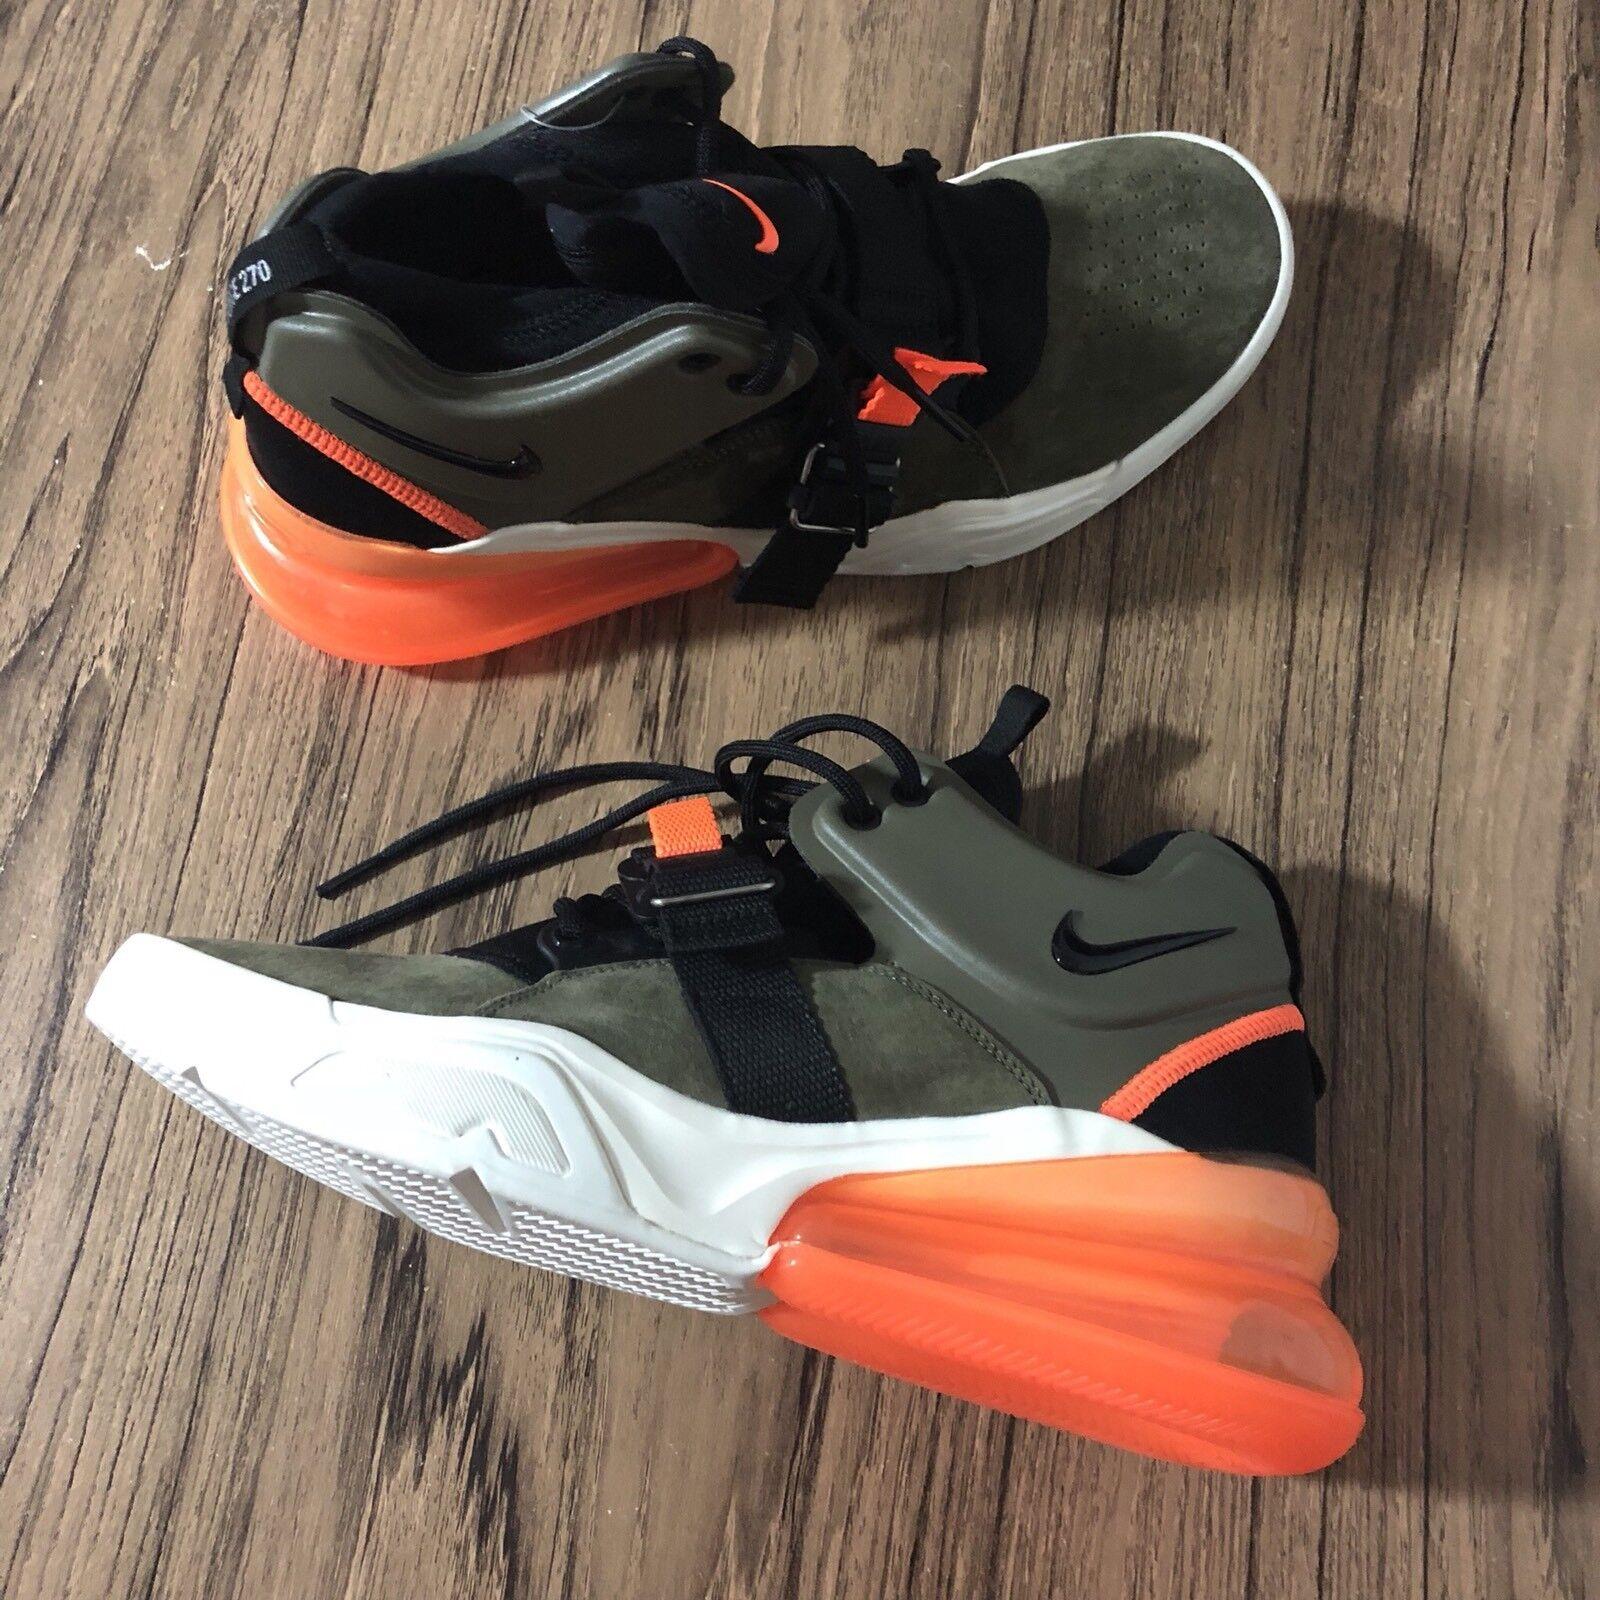 A543 Nike Air Force 270 Sample Olive orange AH6772-200 Size 9 Men's NEW